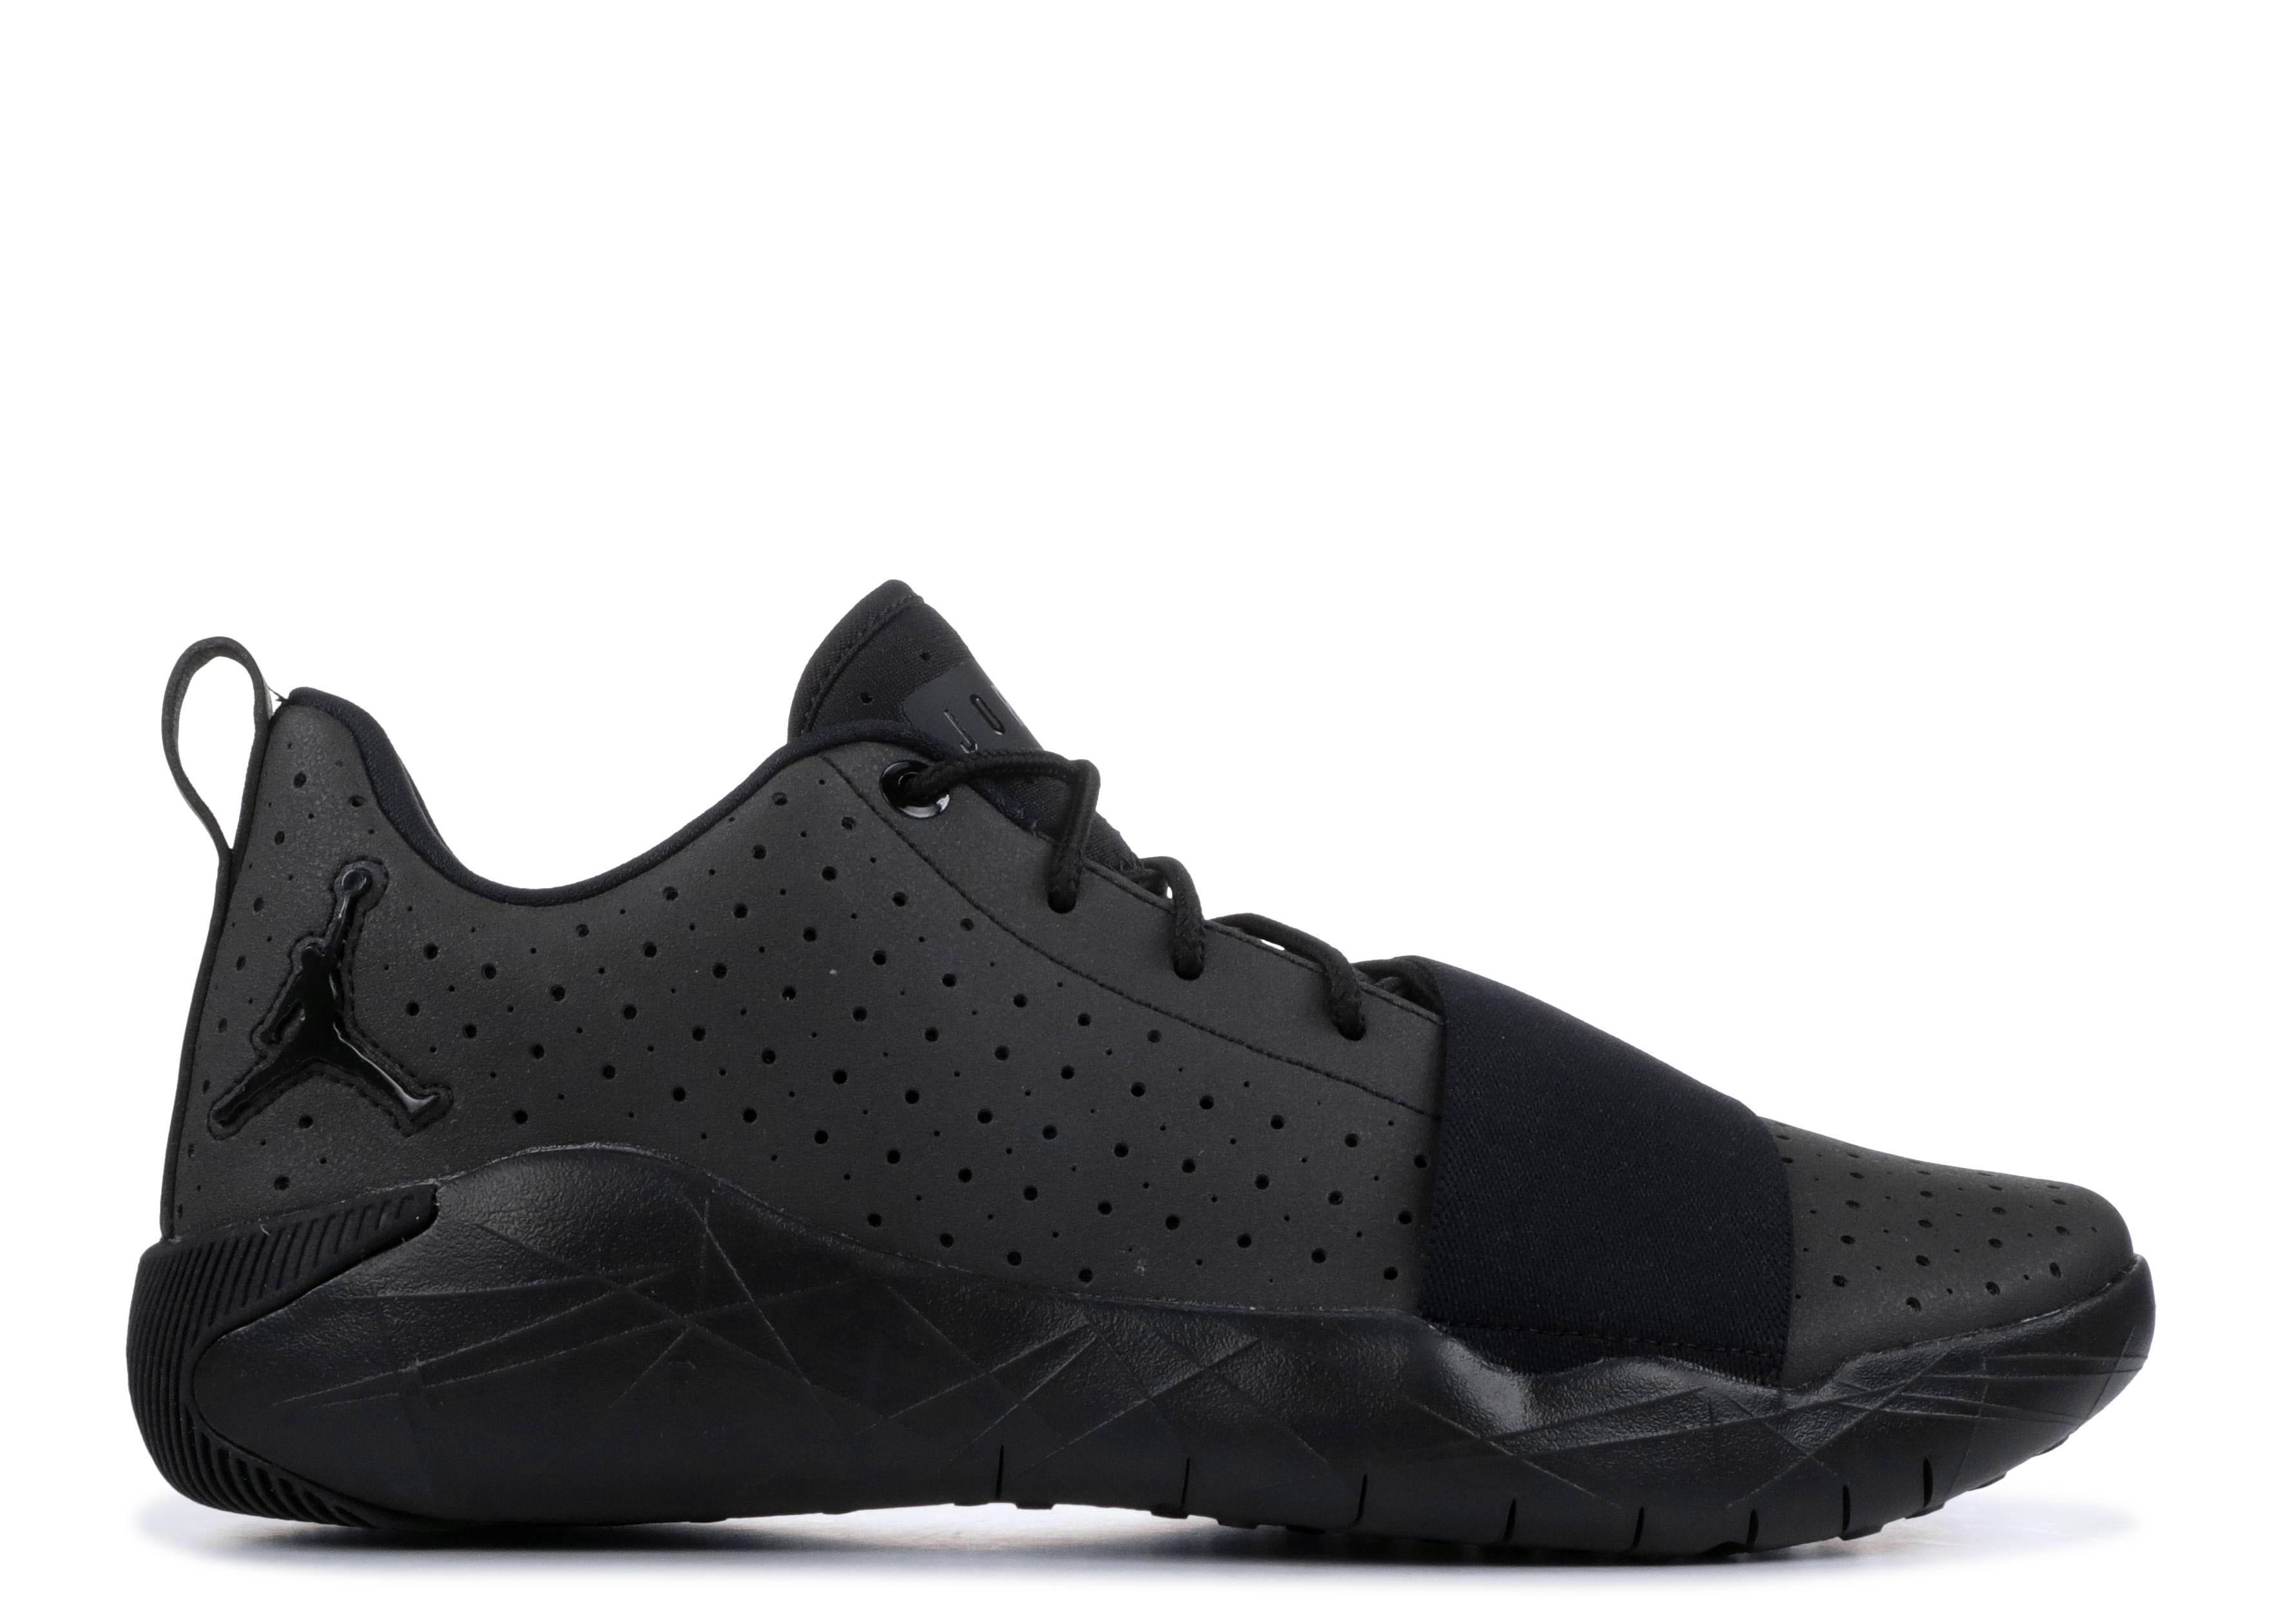 b07380b25910b8 Air Jordan 23 (XXIII) Shoes - Nike